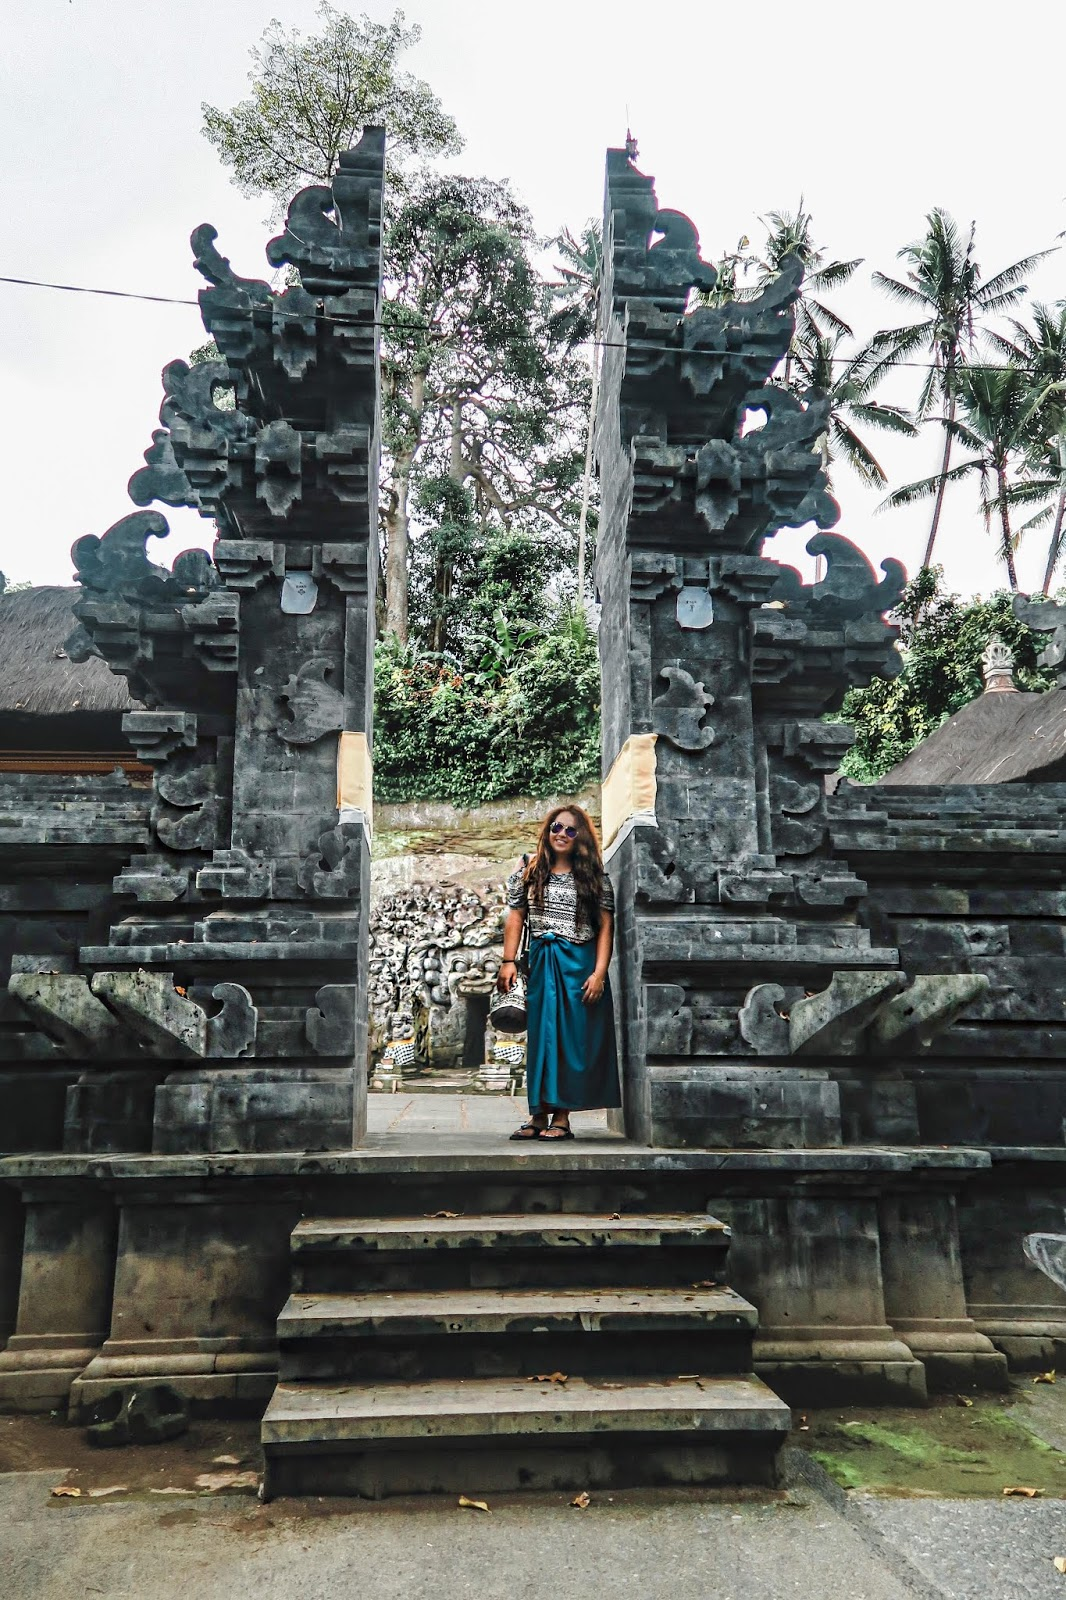 Goa Gajah Ubud Bali Indonesia